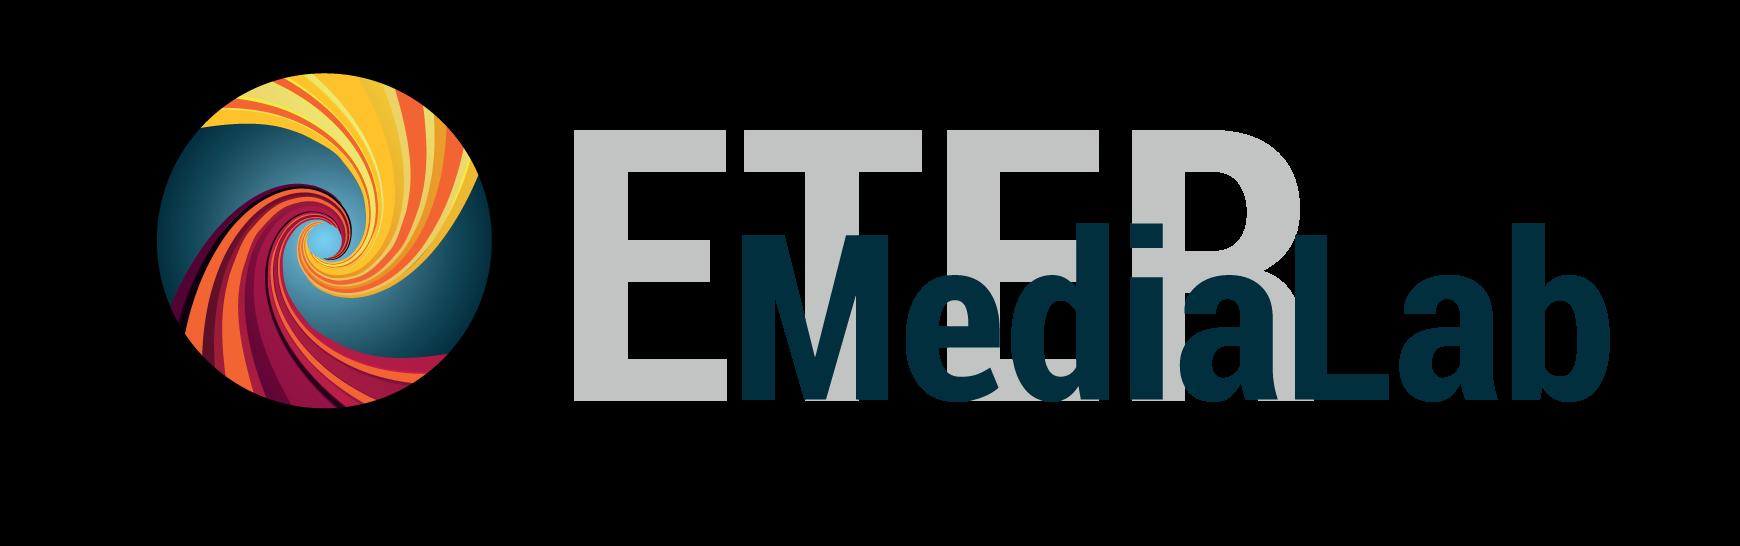 ETER MediaLab